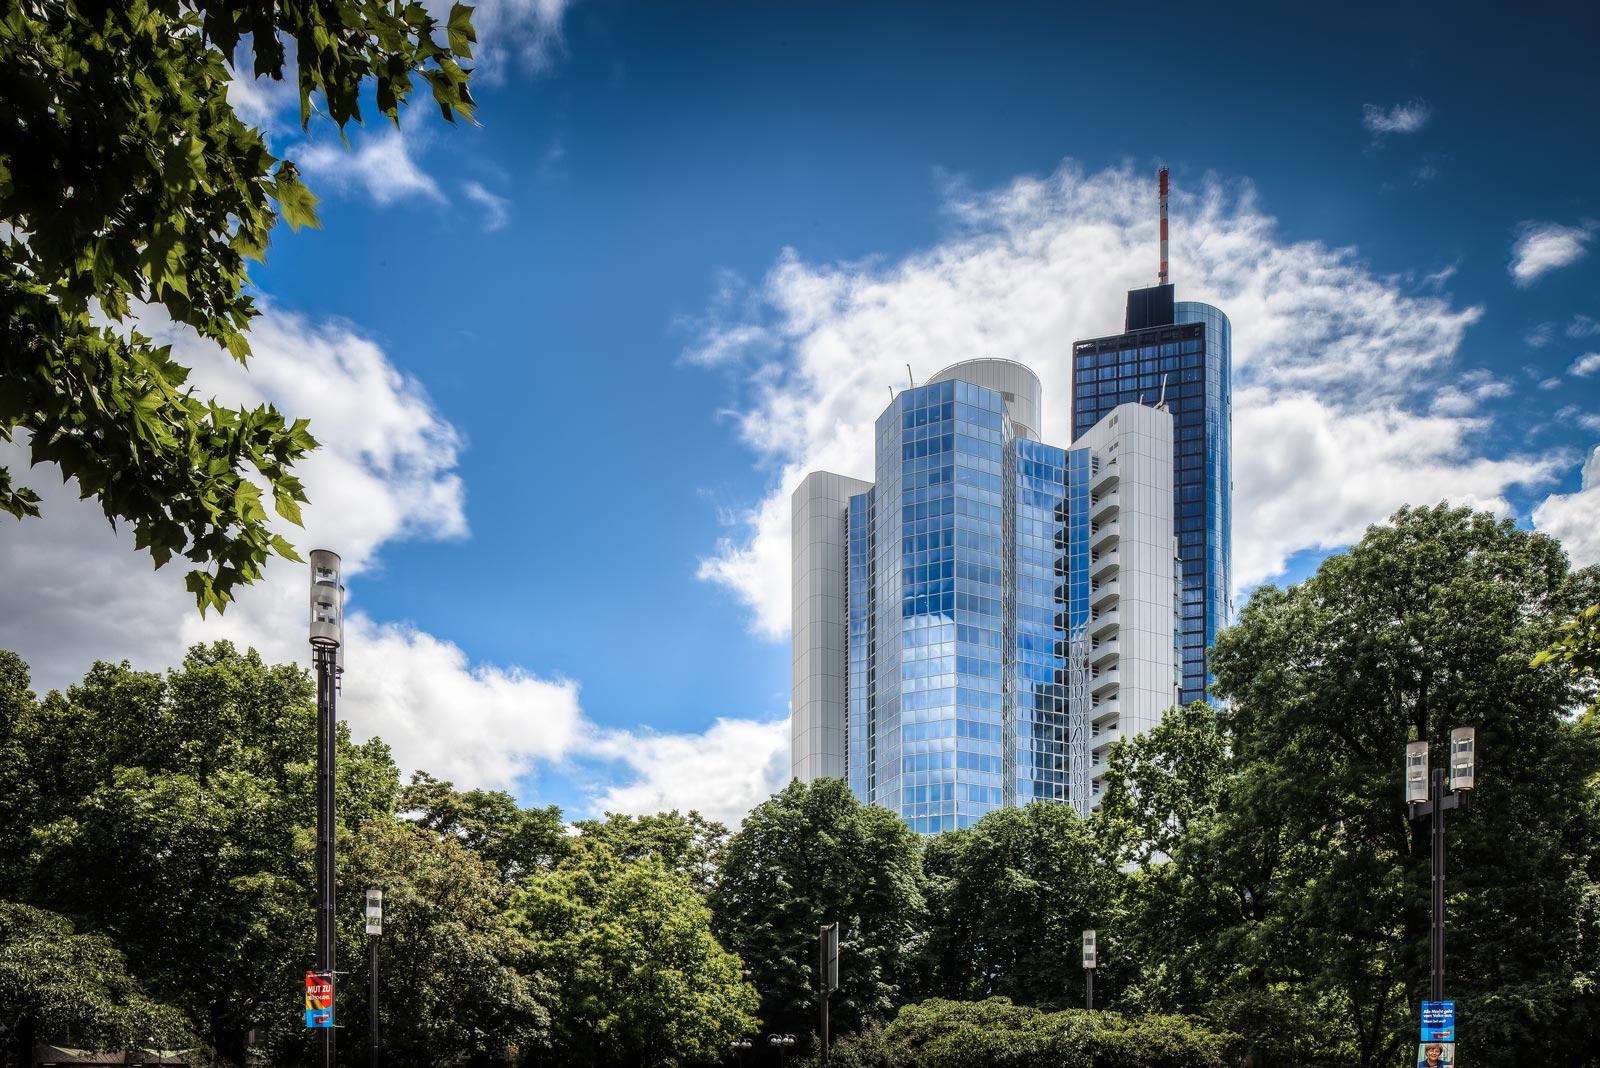 Frankfurt Alte Oper - Business Center